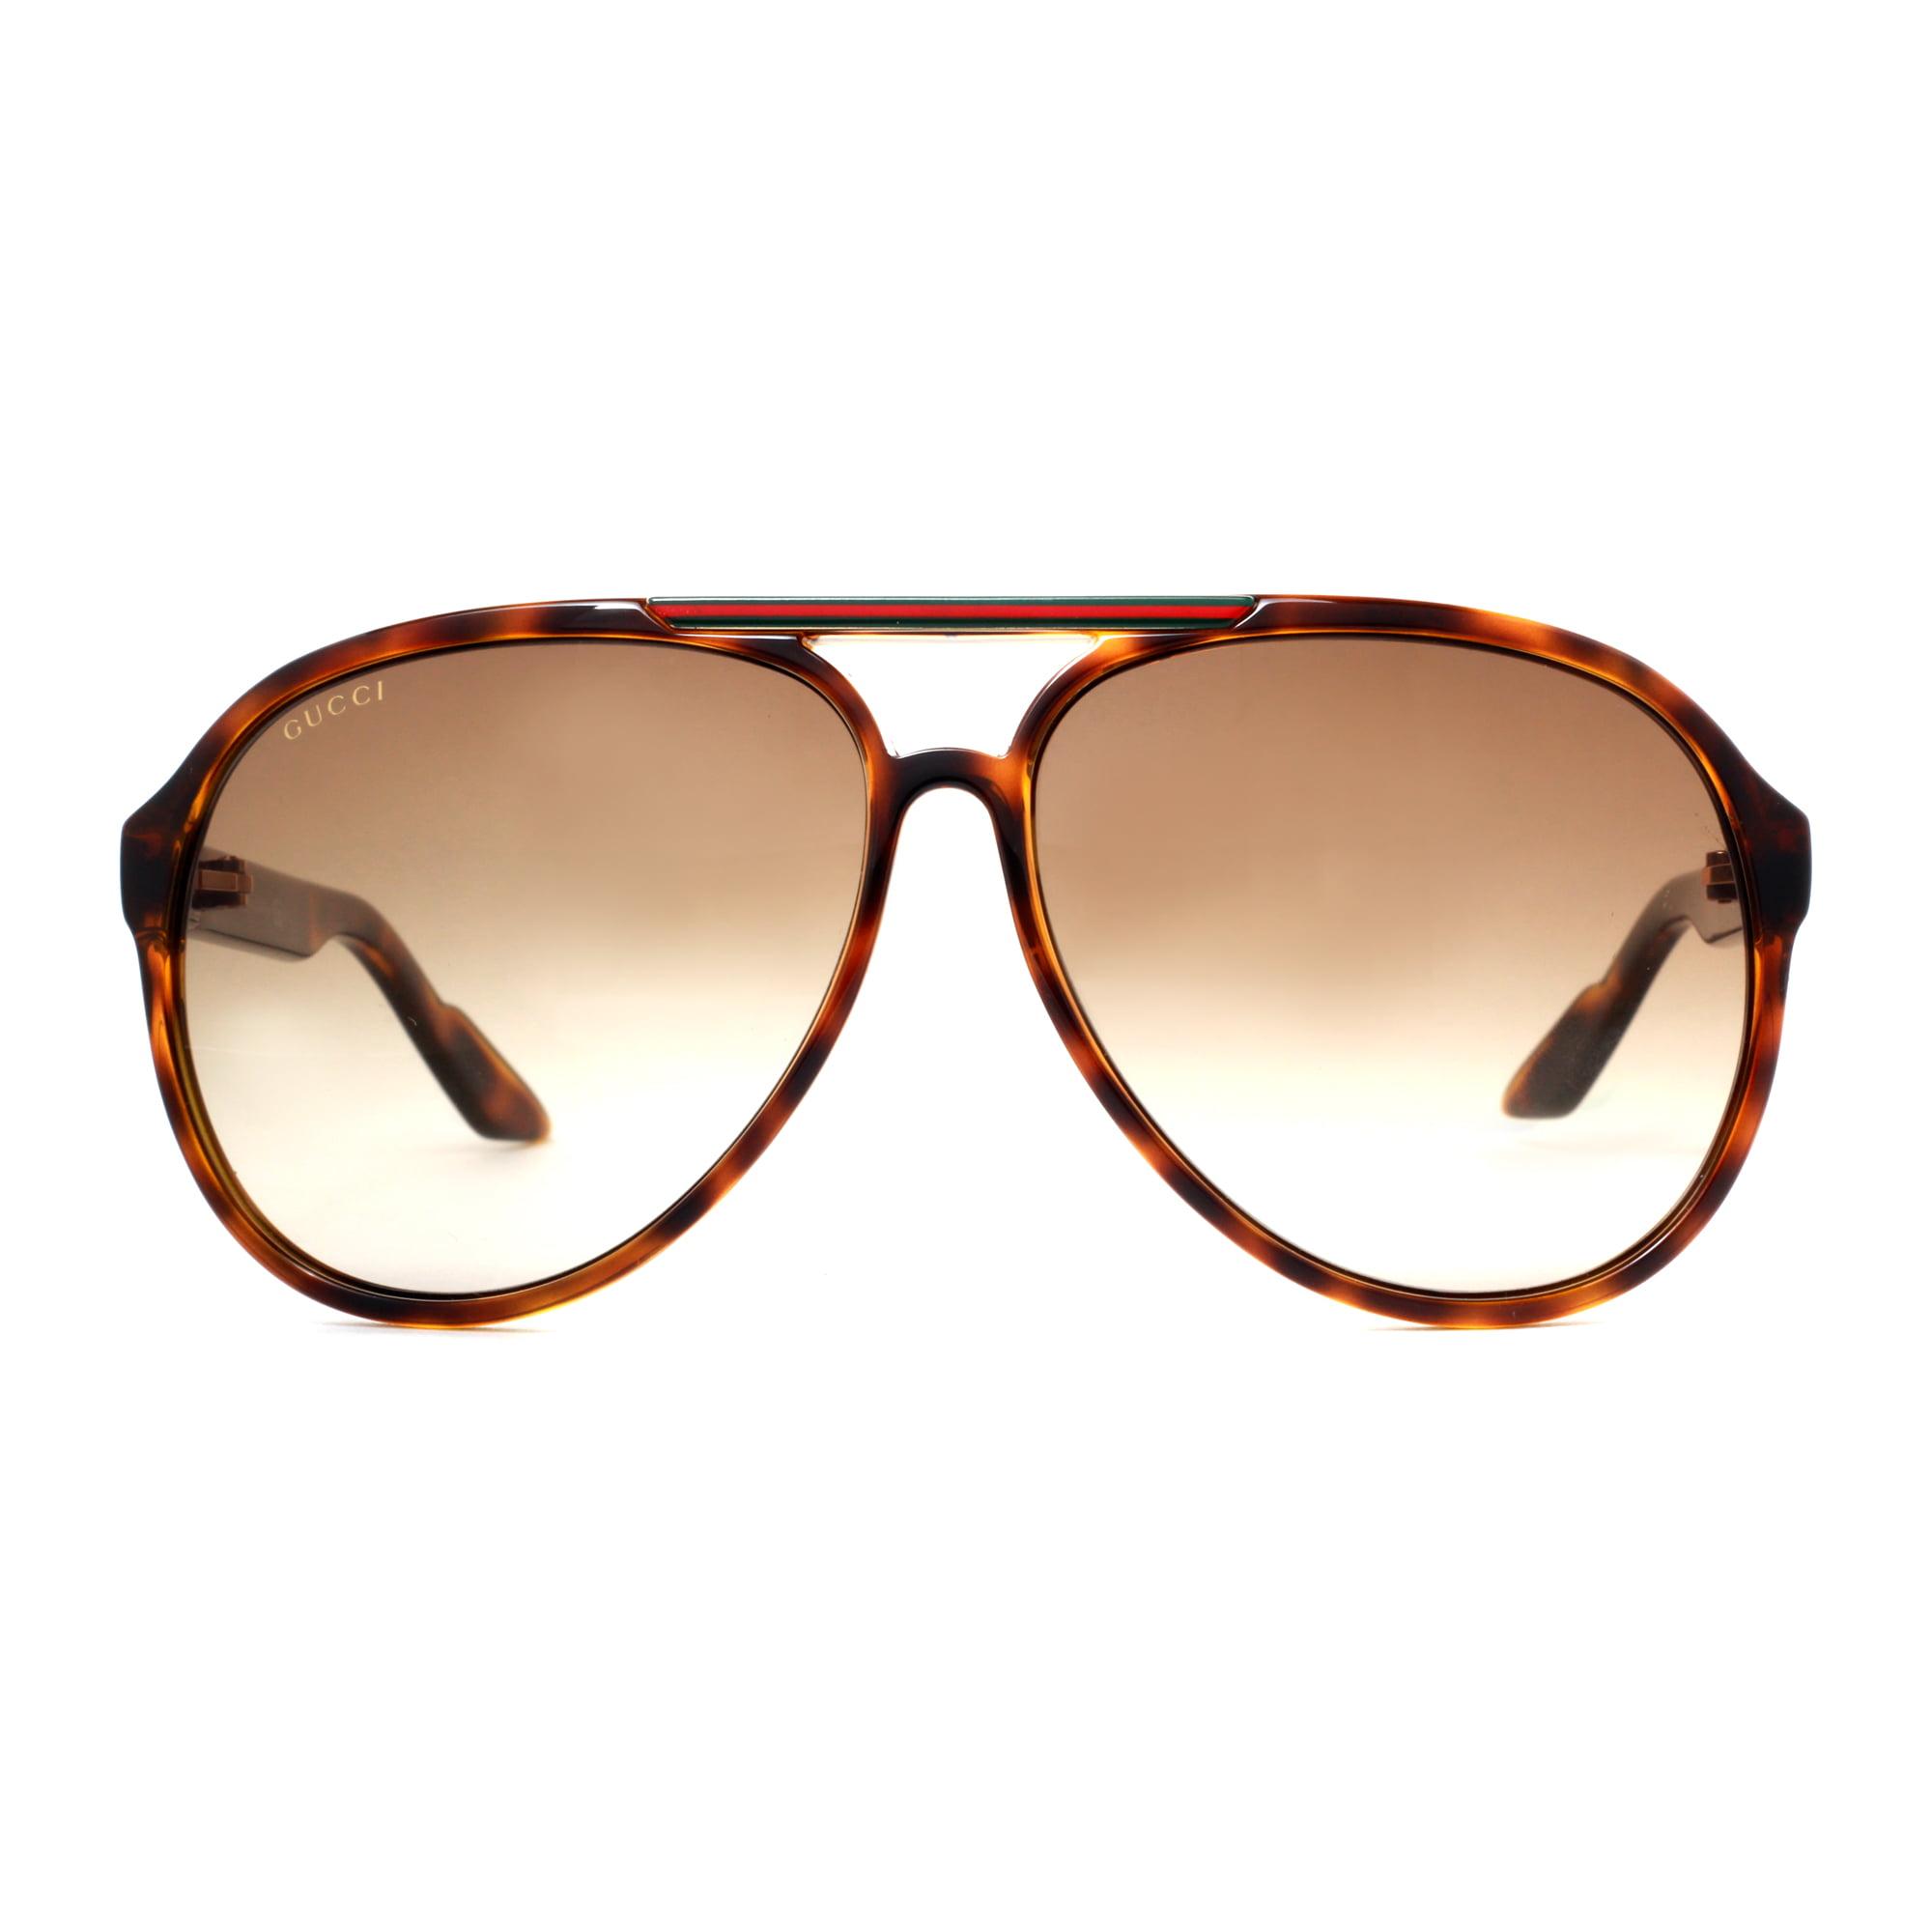 3f543799f89 GUCCI - GUCCI Sunglasses 1627 S 0791 Havana 59MM - Walmart.com